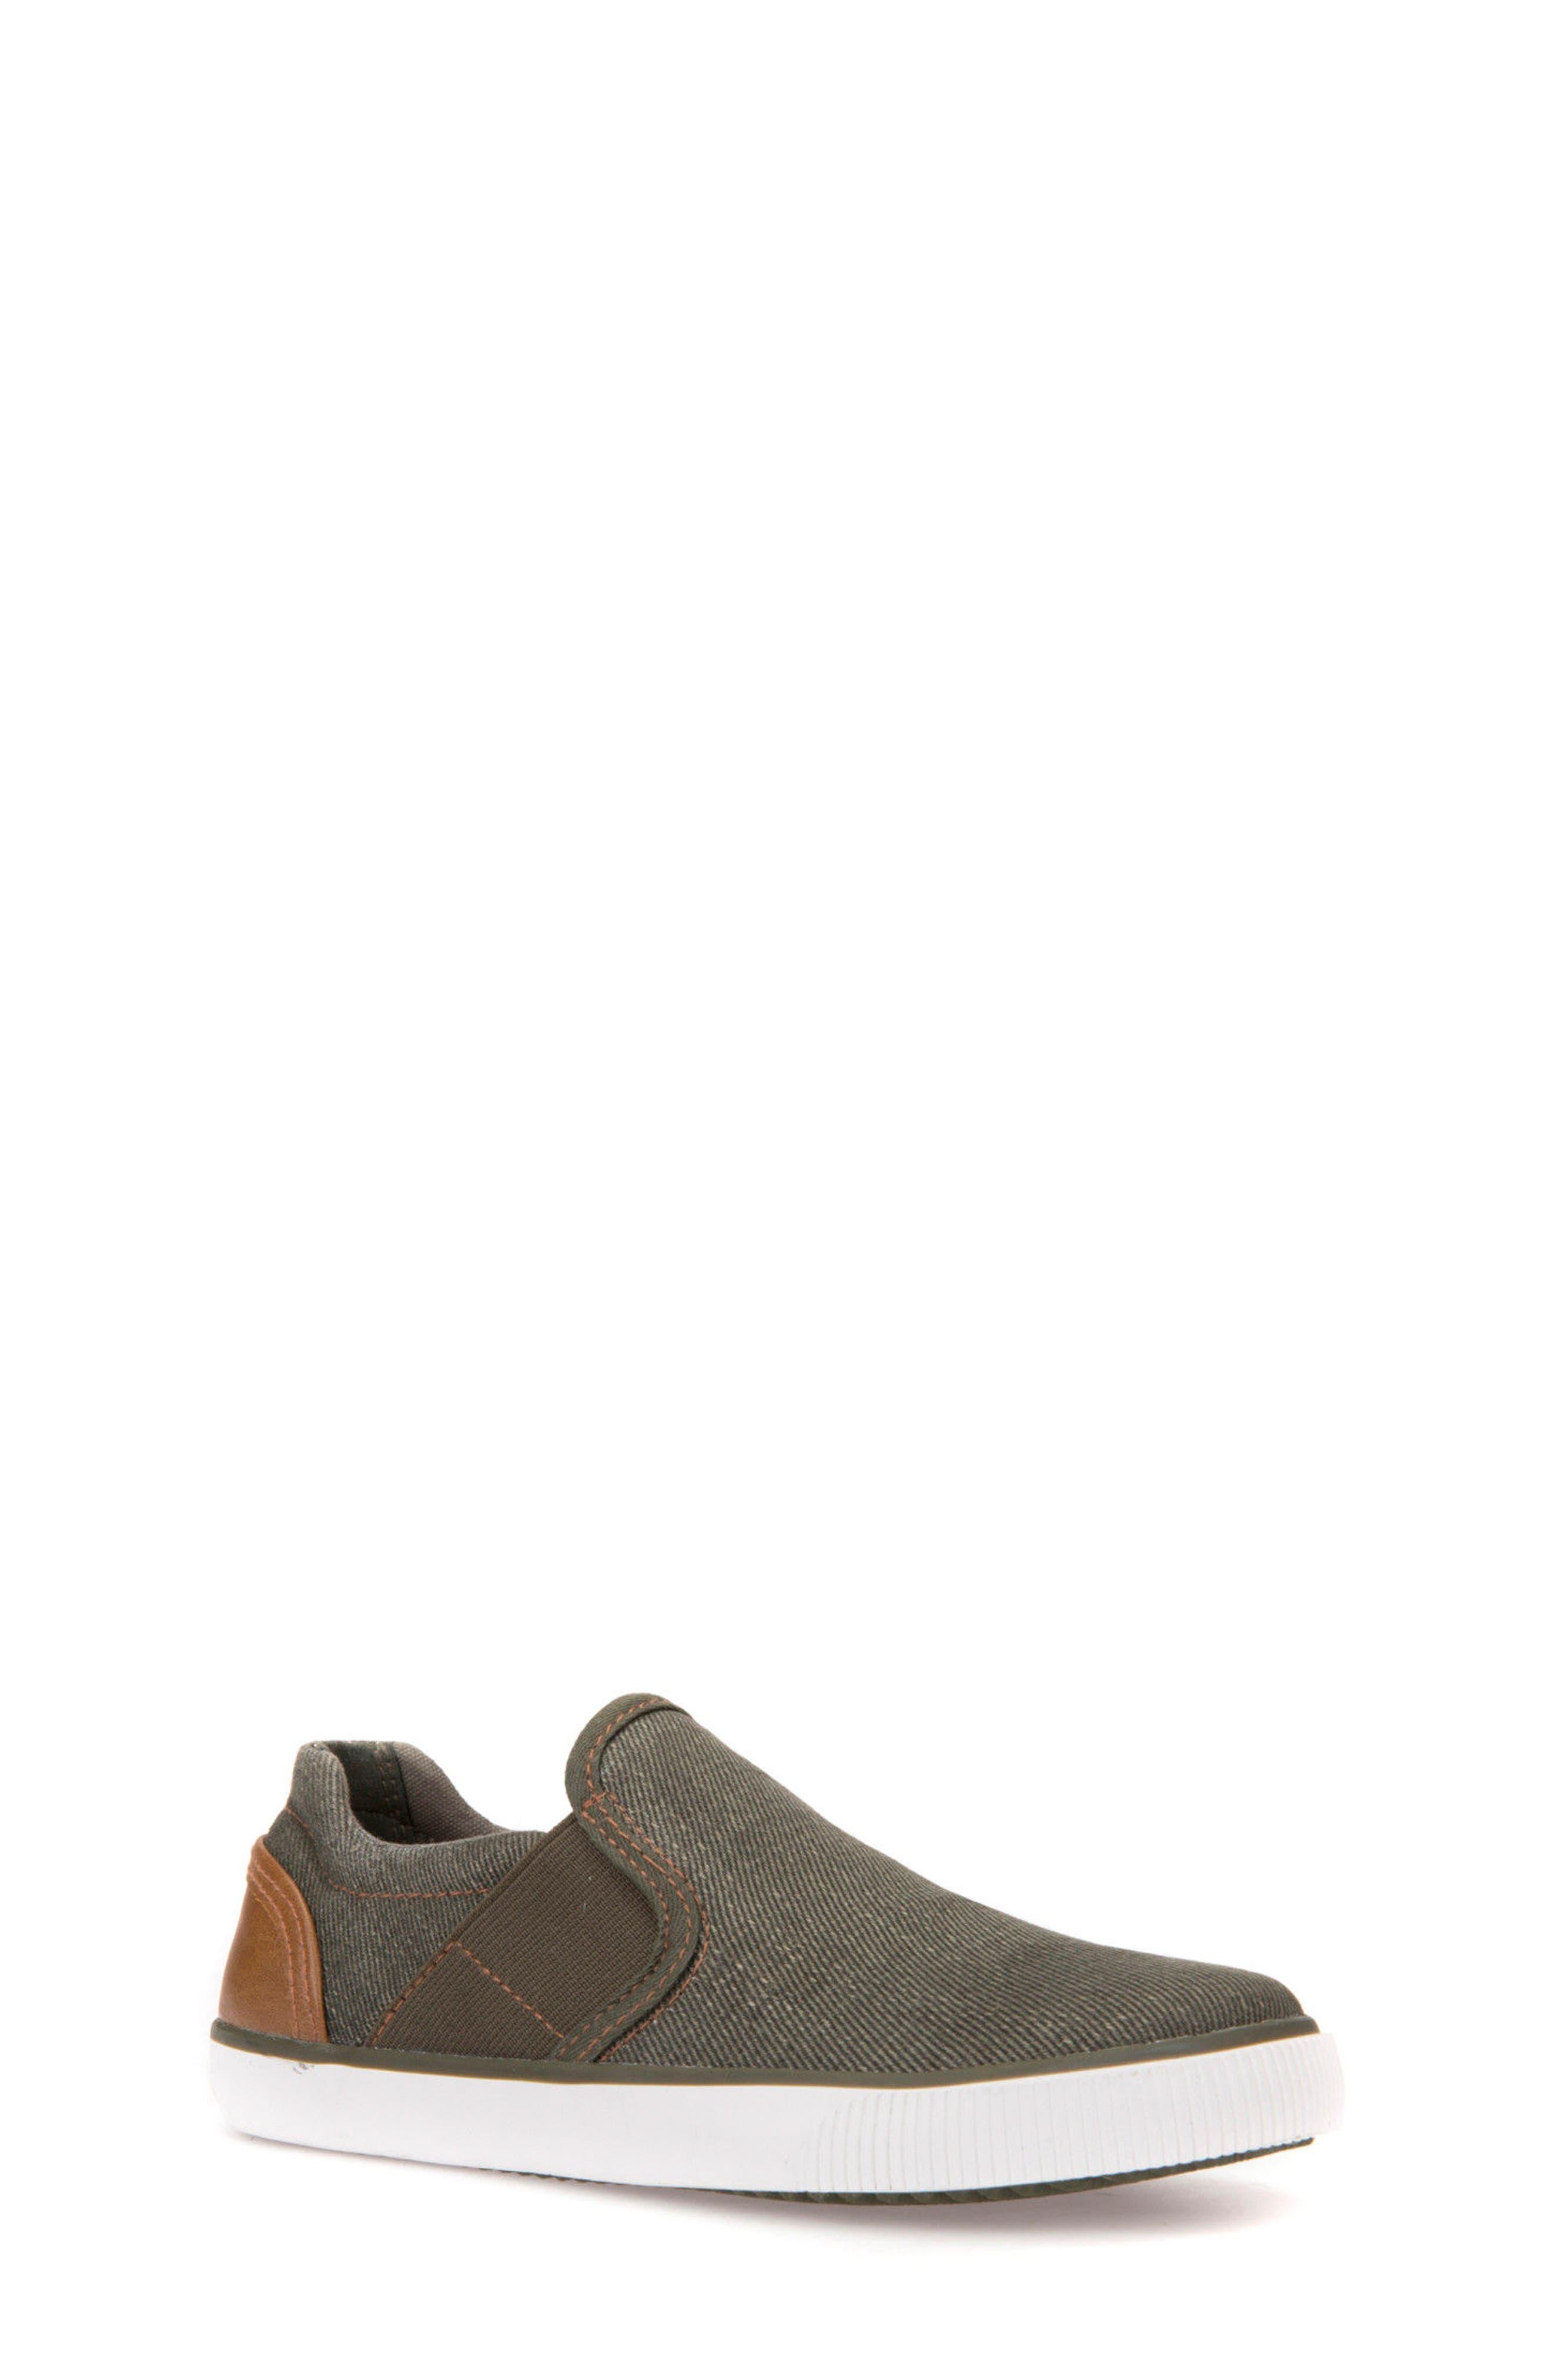 Kilwi Slip-On Sneaker,                         Main,                         color, Military/ Light Brown